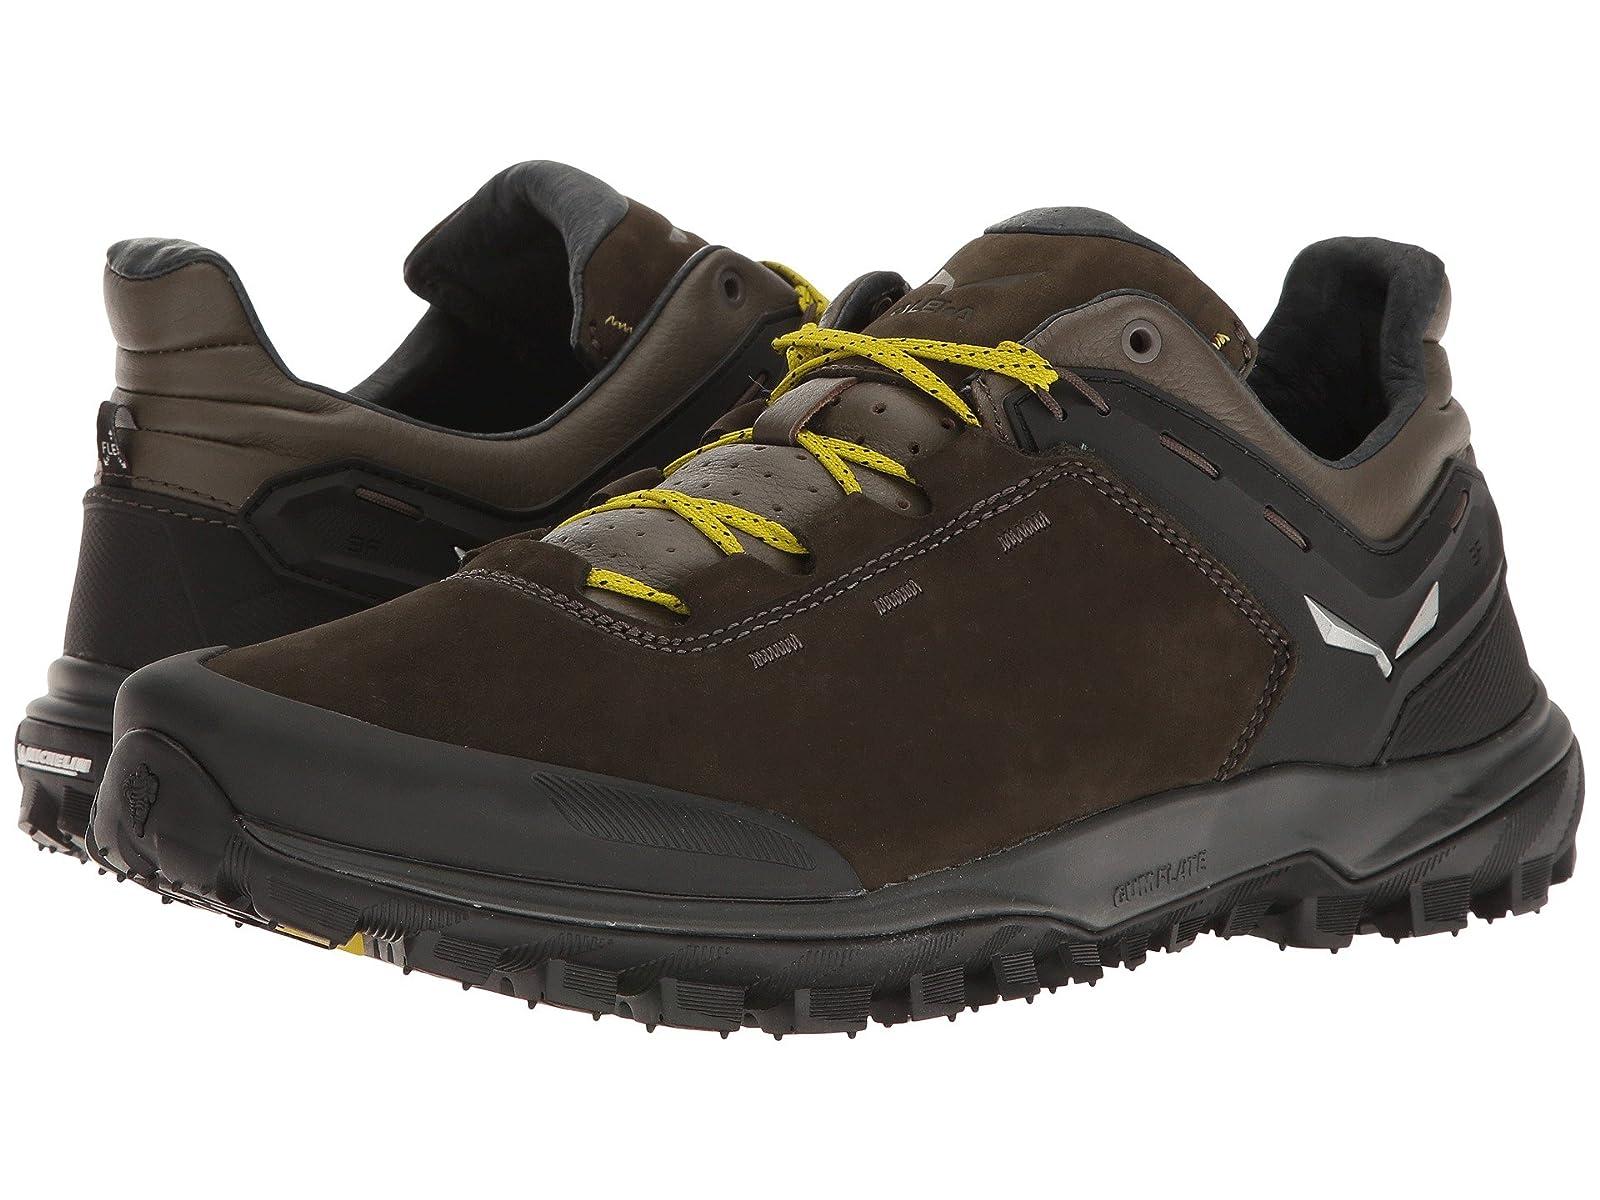 SALEWA Wander Hiker LeatherAtmospheric grades have affordable shoes